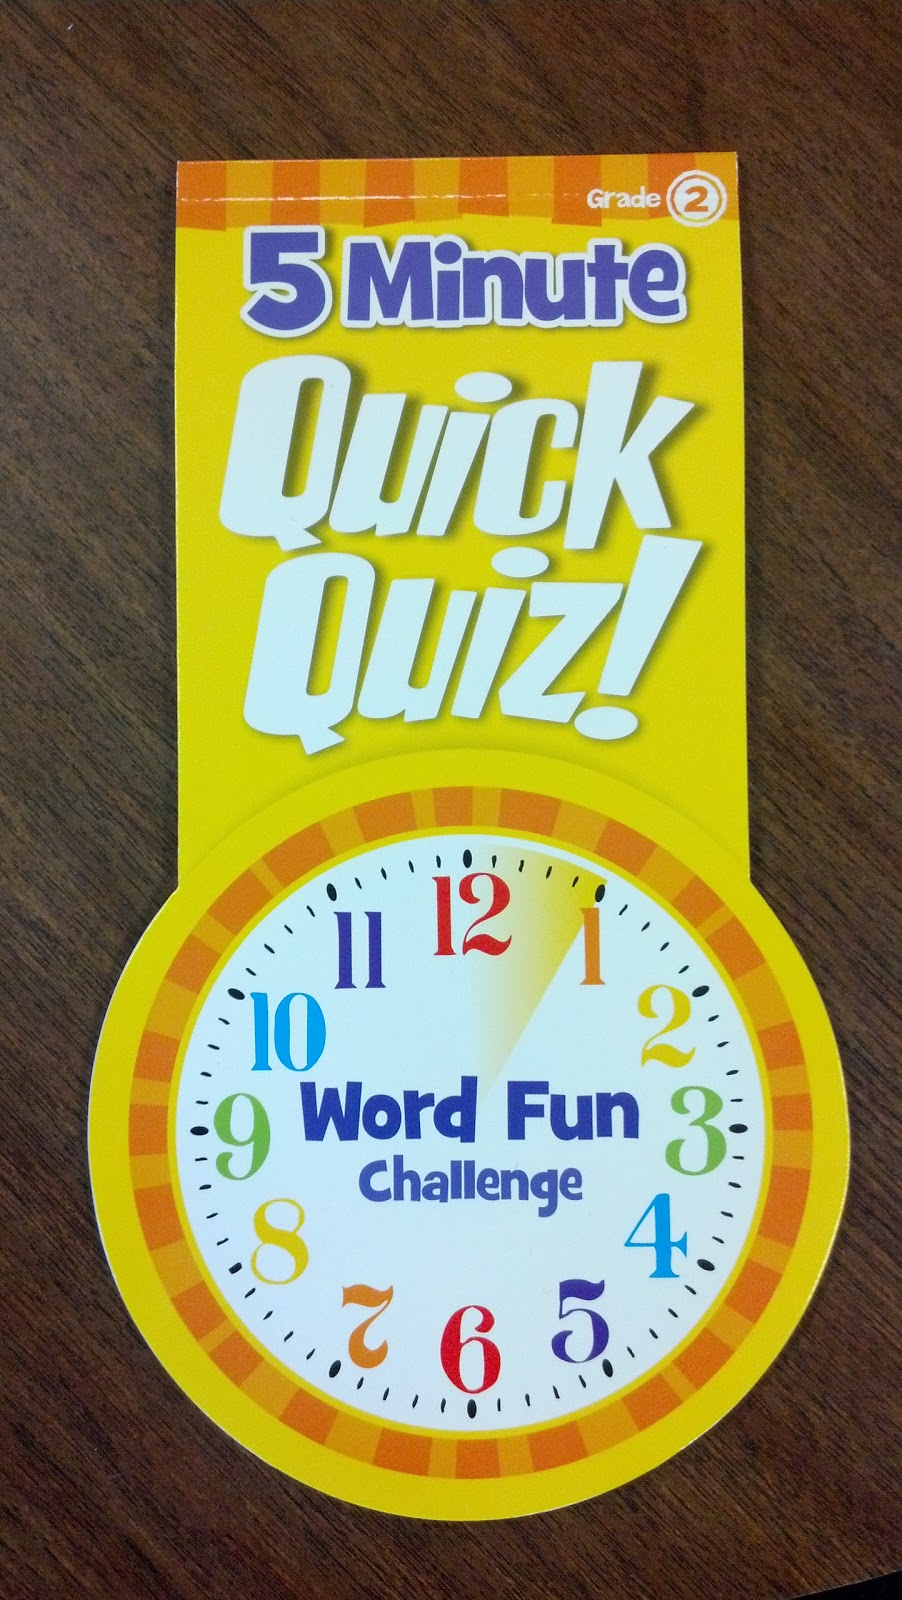 Schoolhouse Talk Good Finds 5 Minute Quick Quiz Word Fun